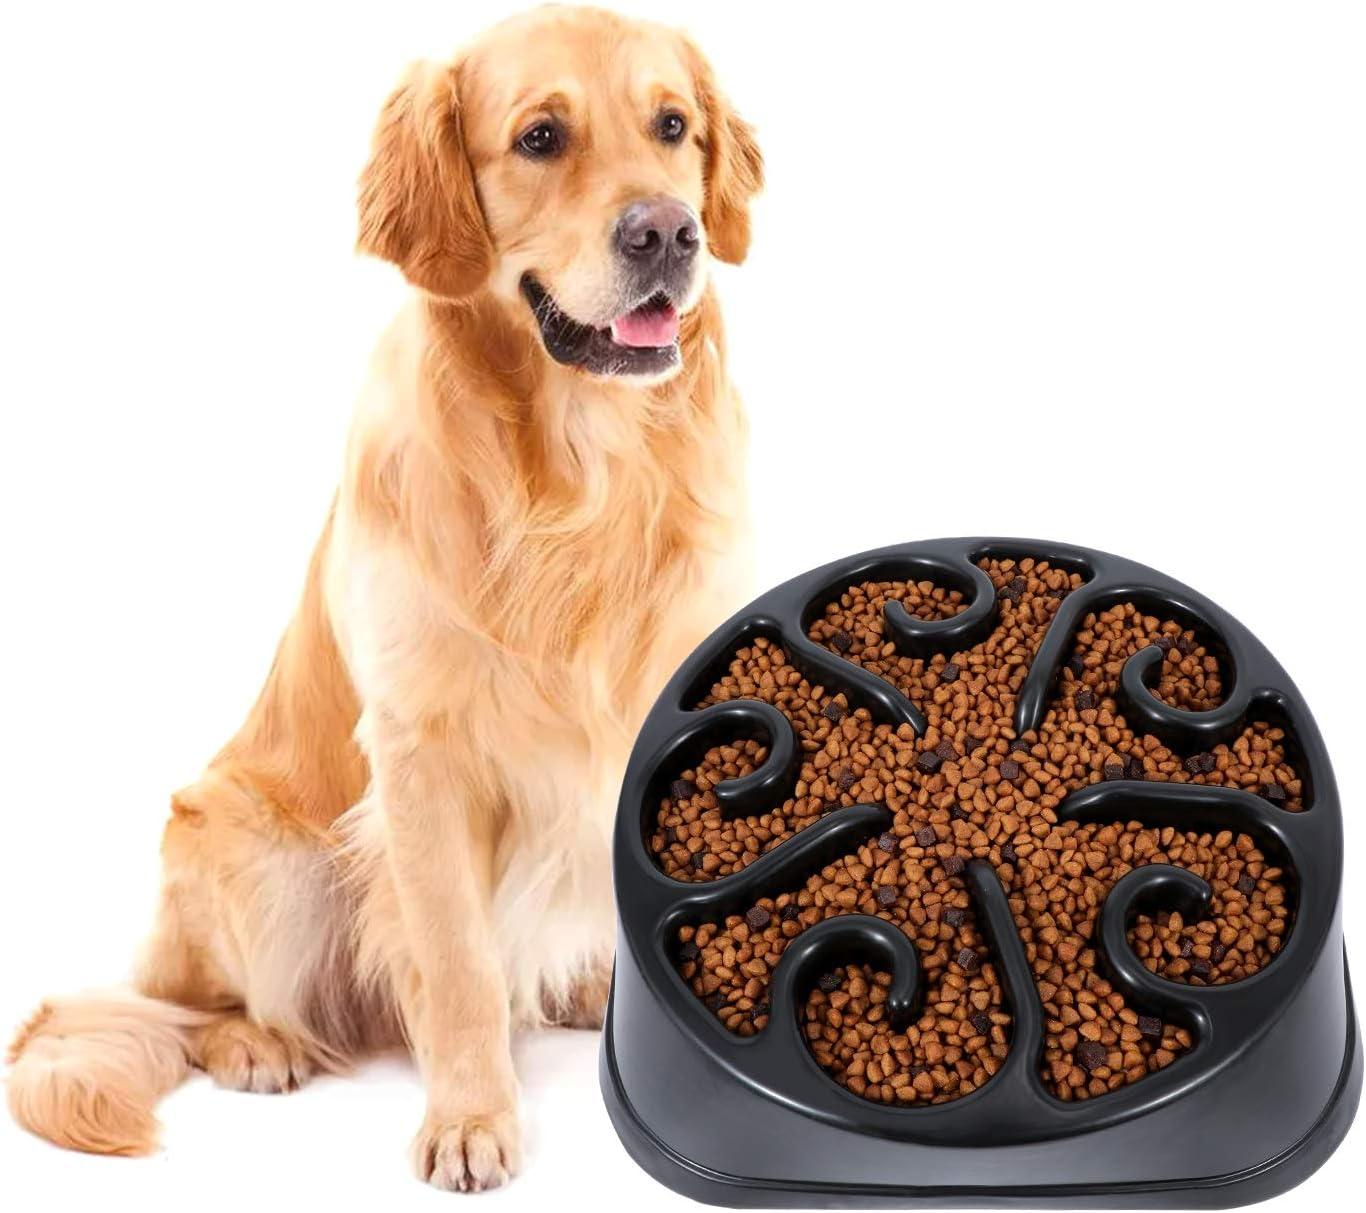 KASBAH Slow Feeder Dog Bowl for Large Dogs, Anti-Gulping Maze Dog Food Bowl Bloat Stop Puzzle Bowl Non-Toxic Eco Friendly Anti-Choke Large Dog Bowls, One Size, E-Black